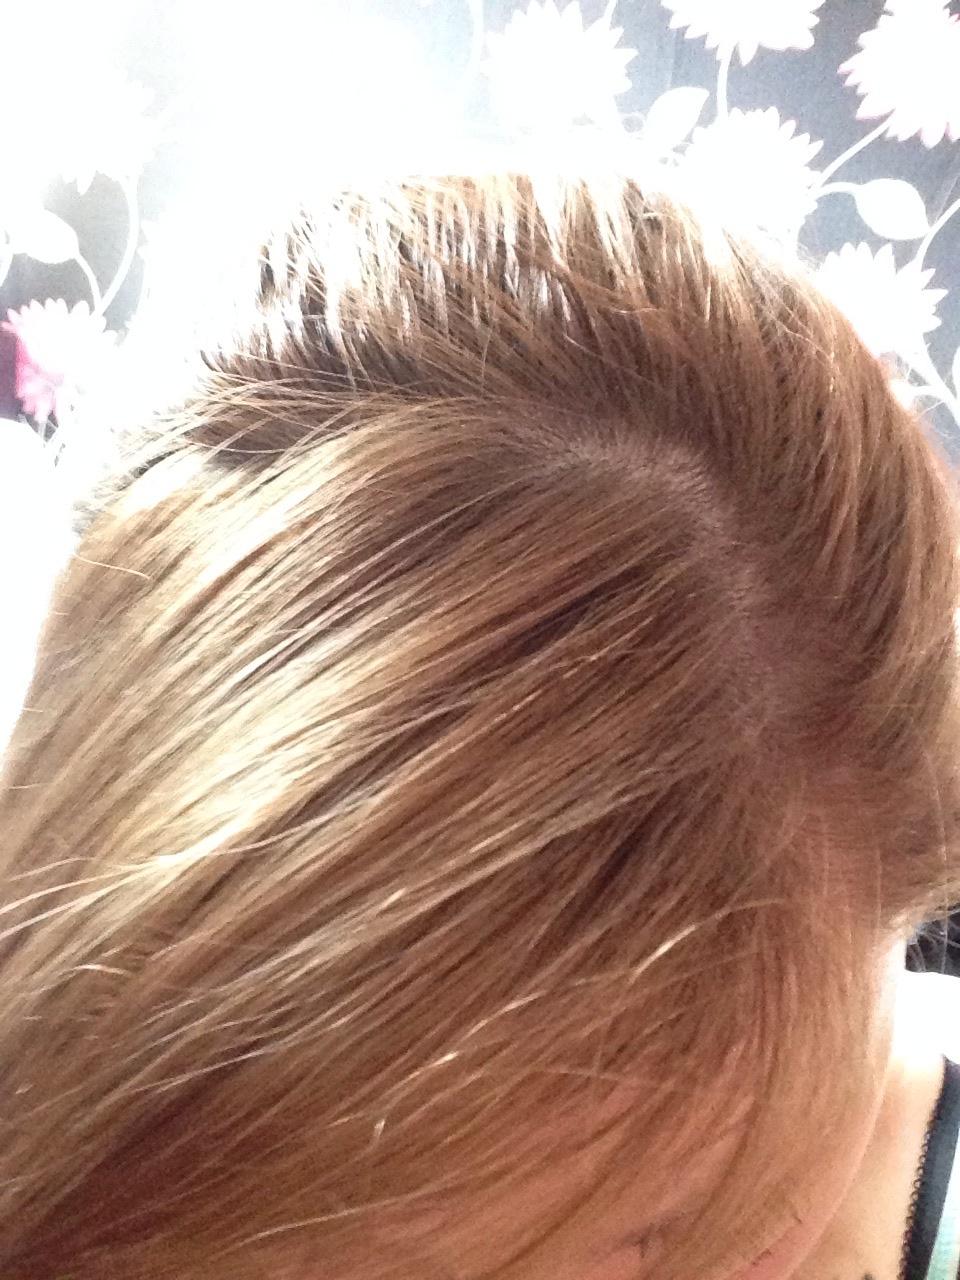 Photo of Ofaglasgowgirl hair in 2014